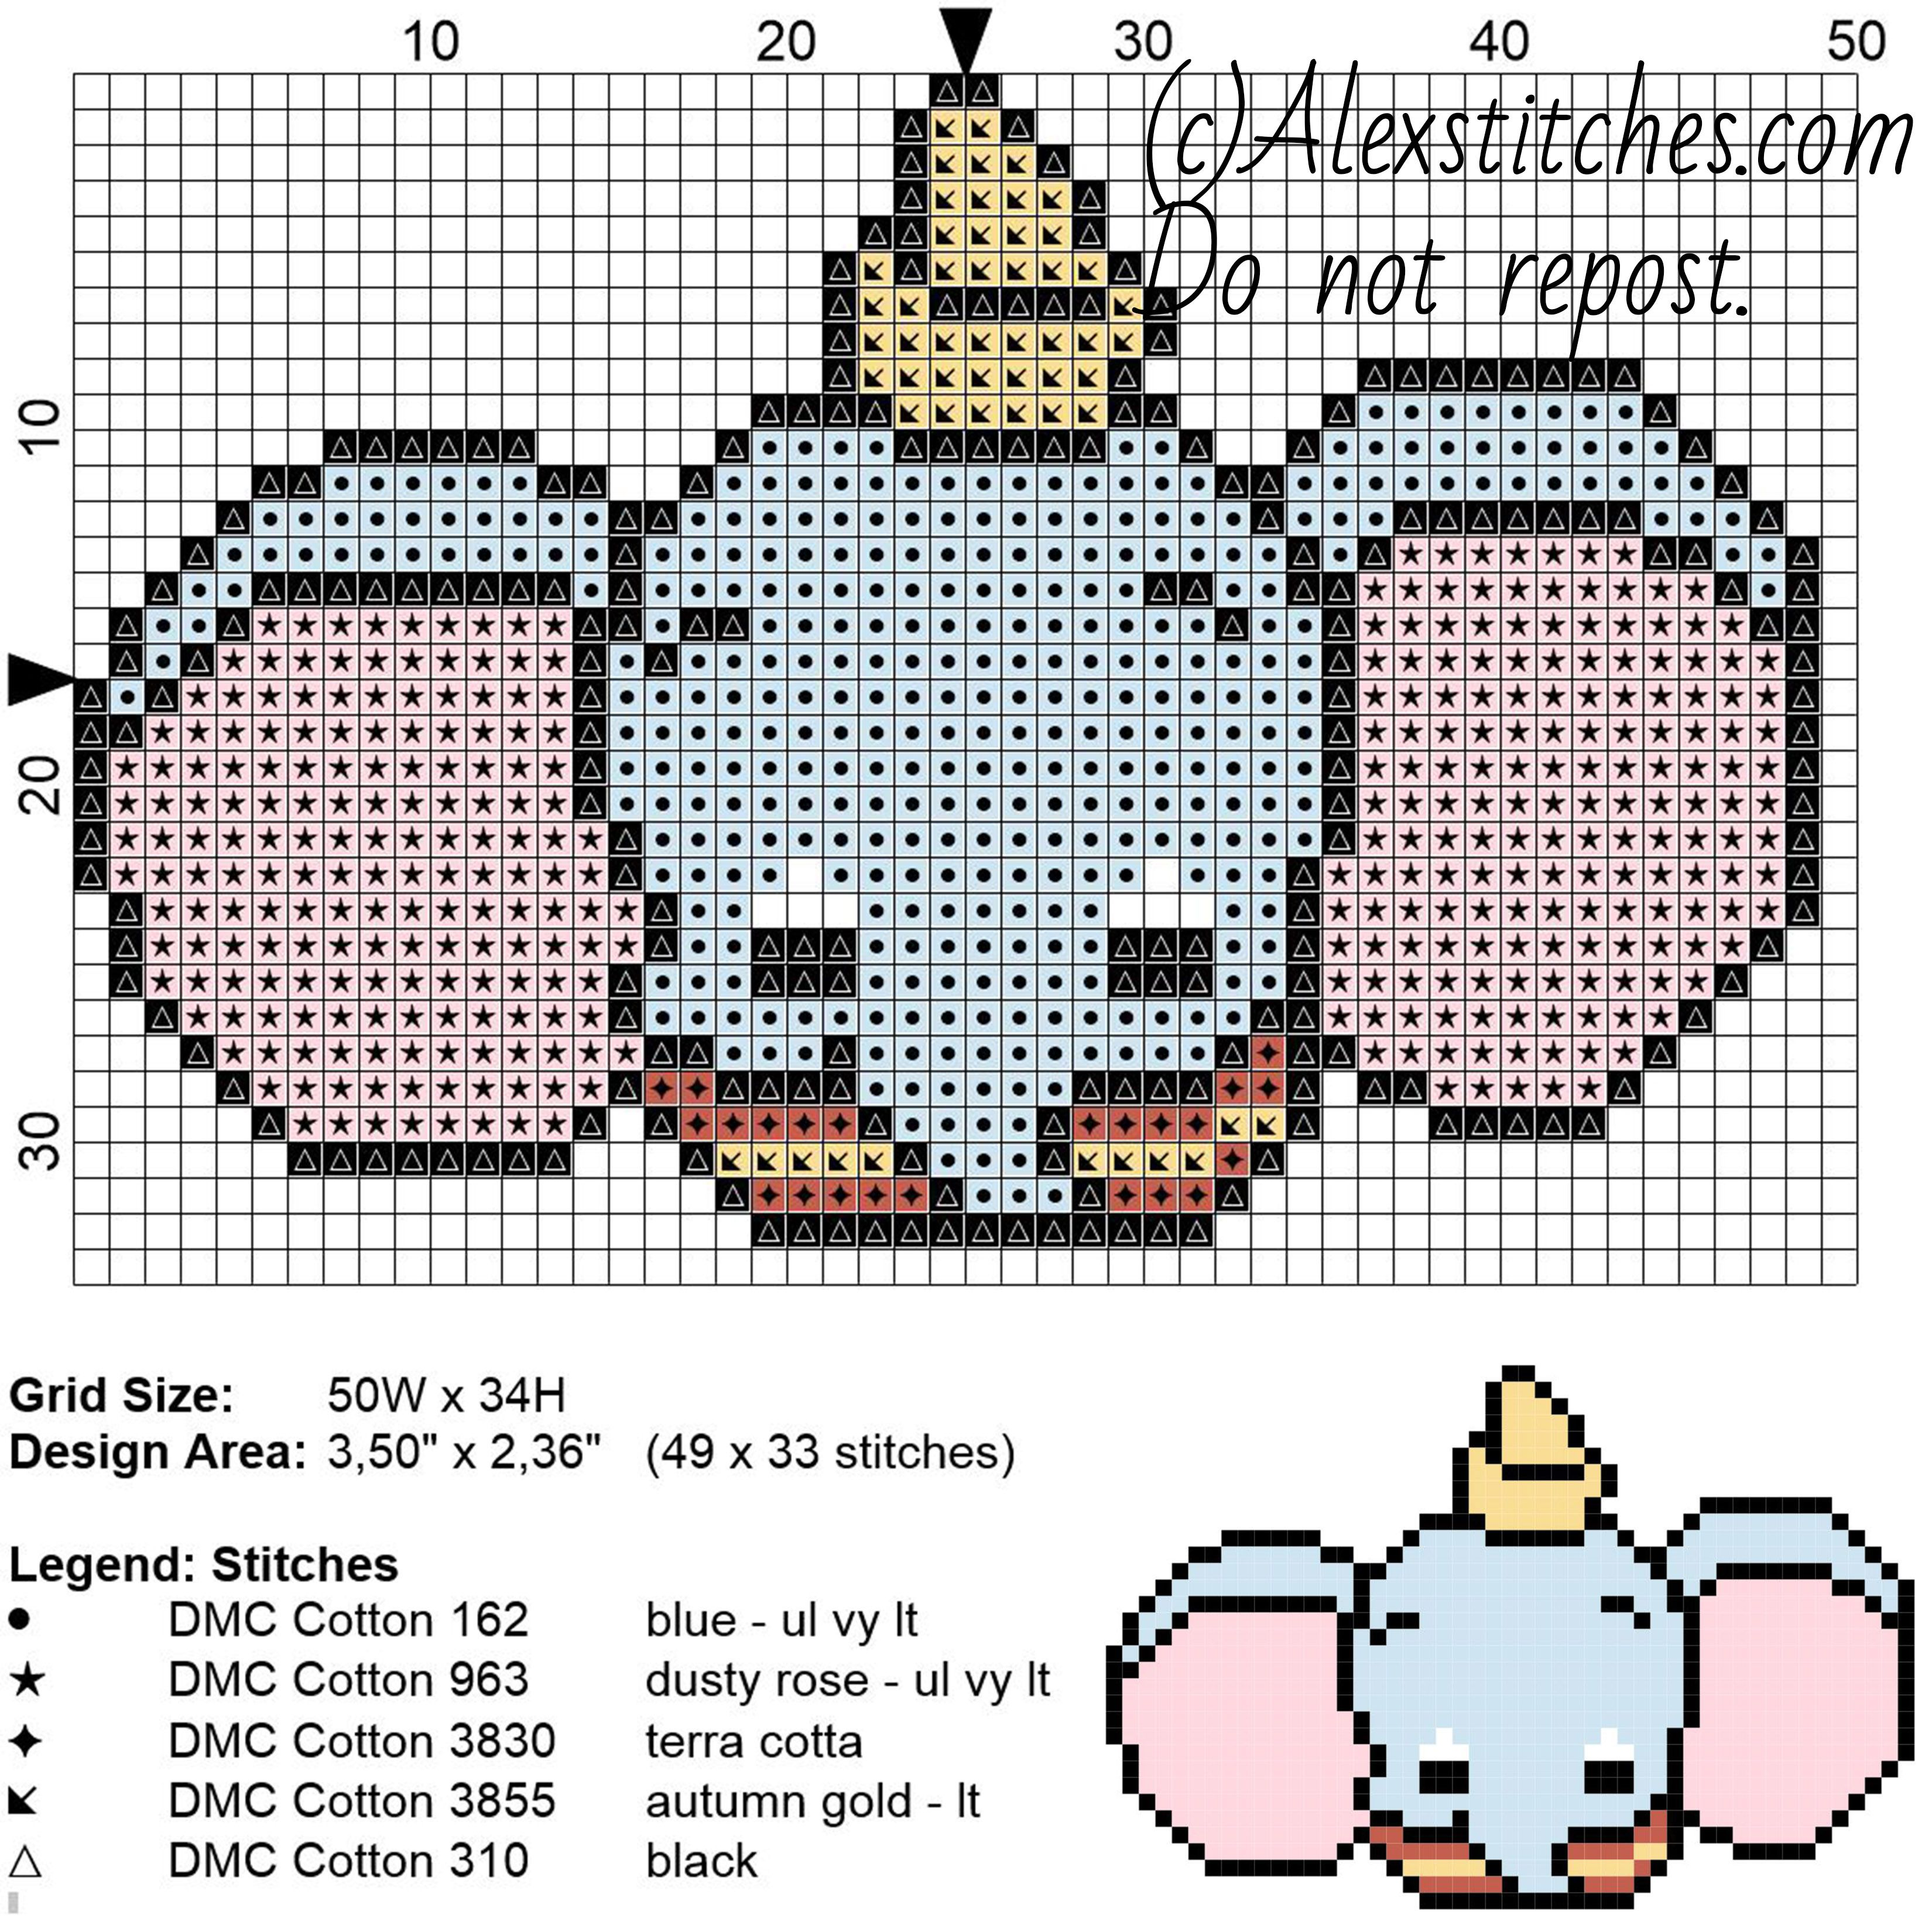 Dumbo Disney Cuties free cross stitch pattern 50x34 5 colors